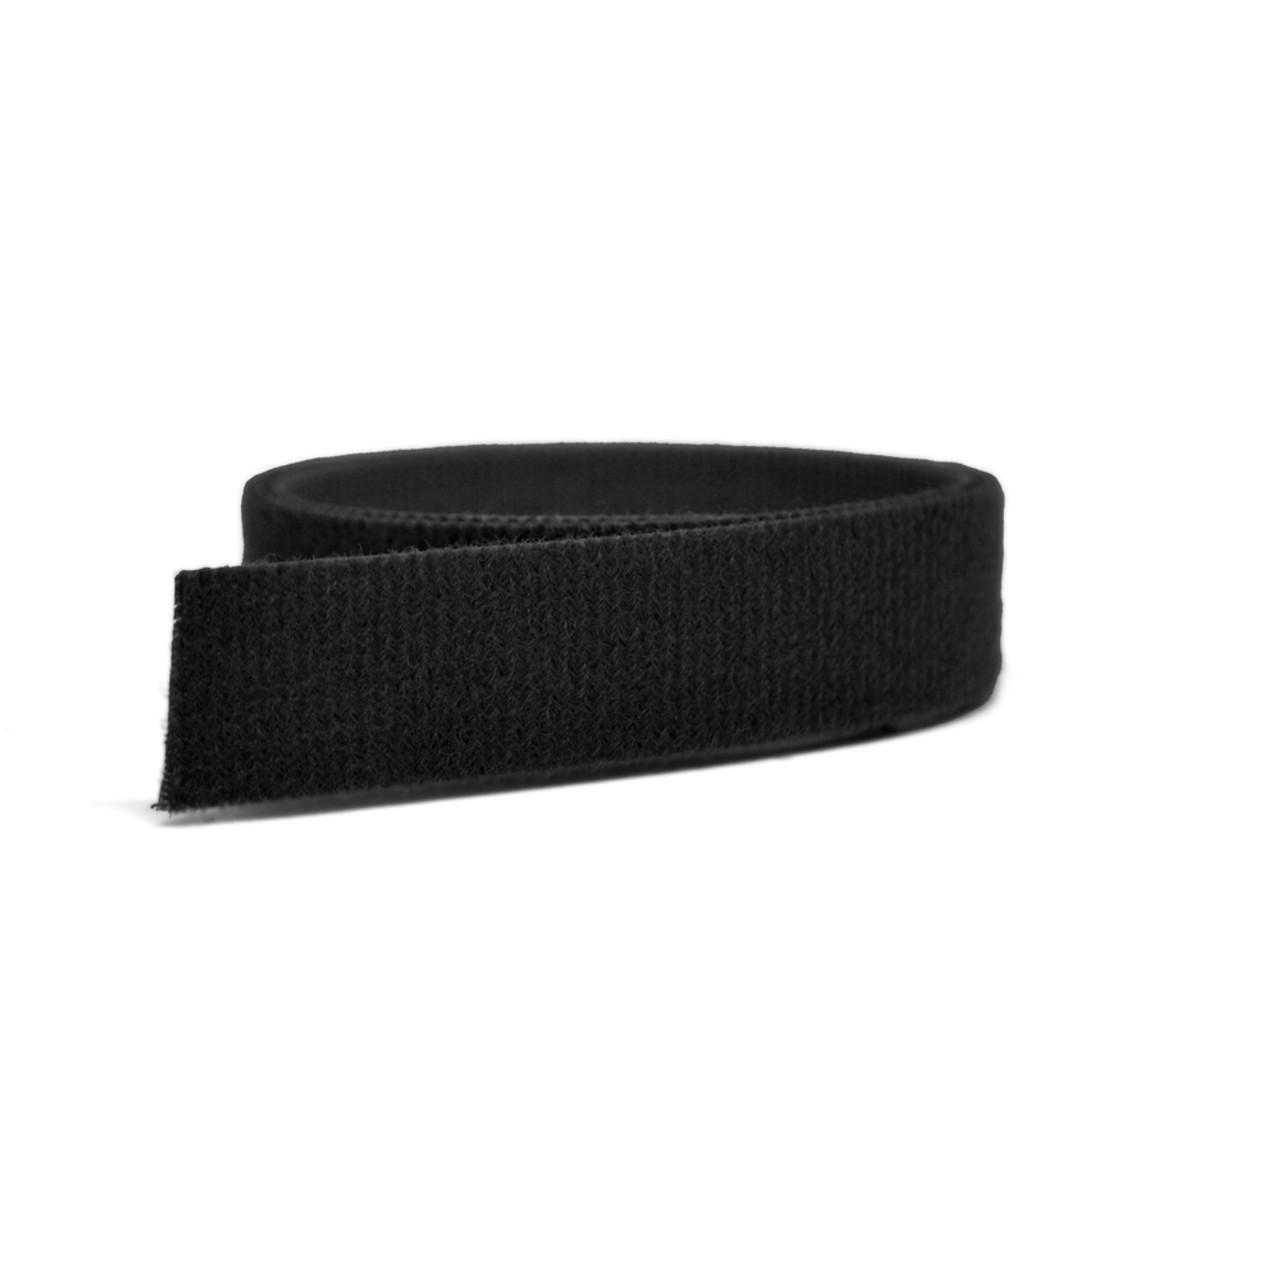 VELCRO® Brand ONE-WRAP® Tape Black Mini Rolls / Velcro Straps - Bundling Straps - Velcro Tie - Velcro Strap